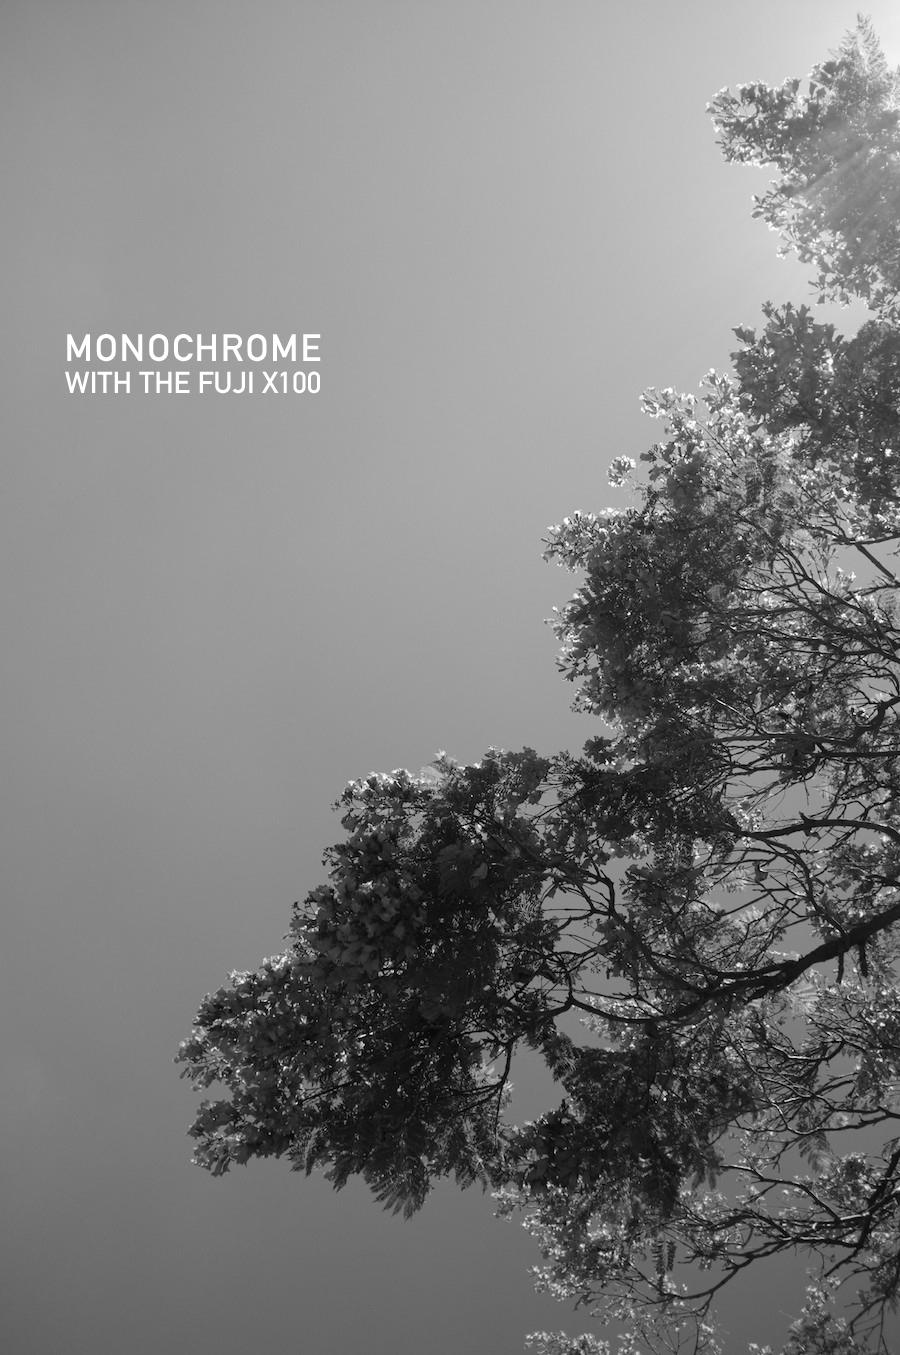 Fuji x100 monochrome